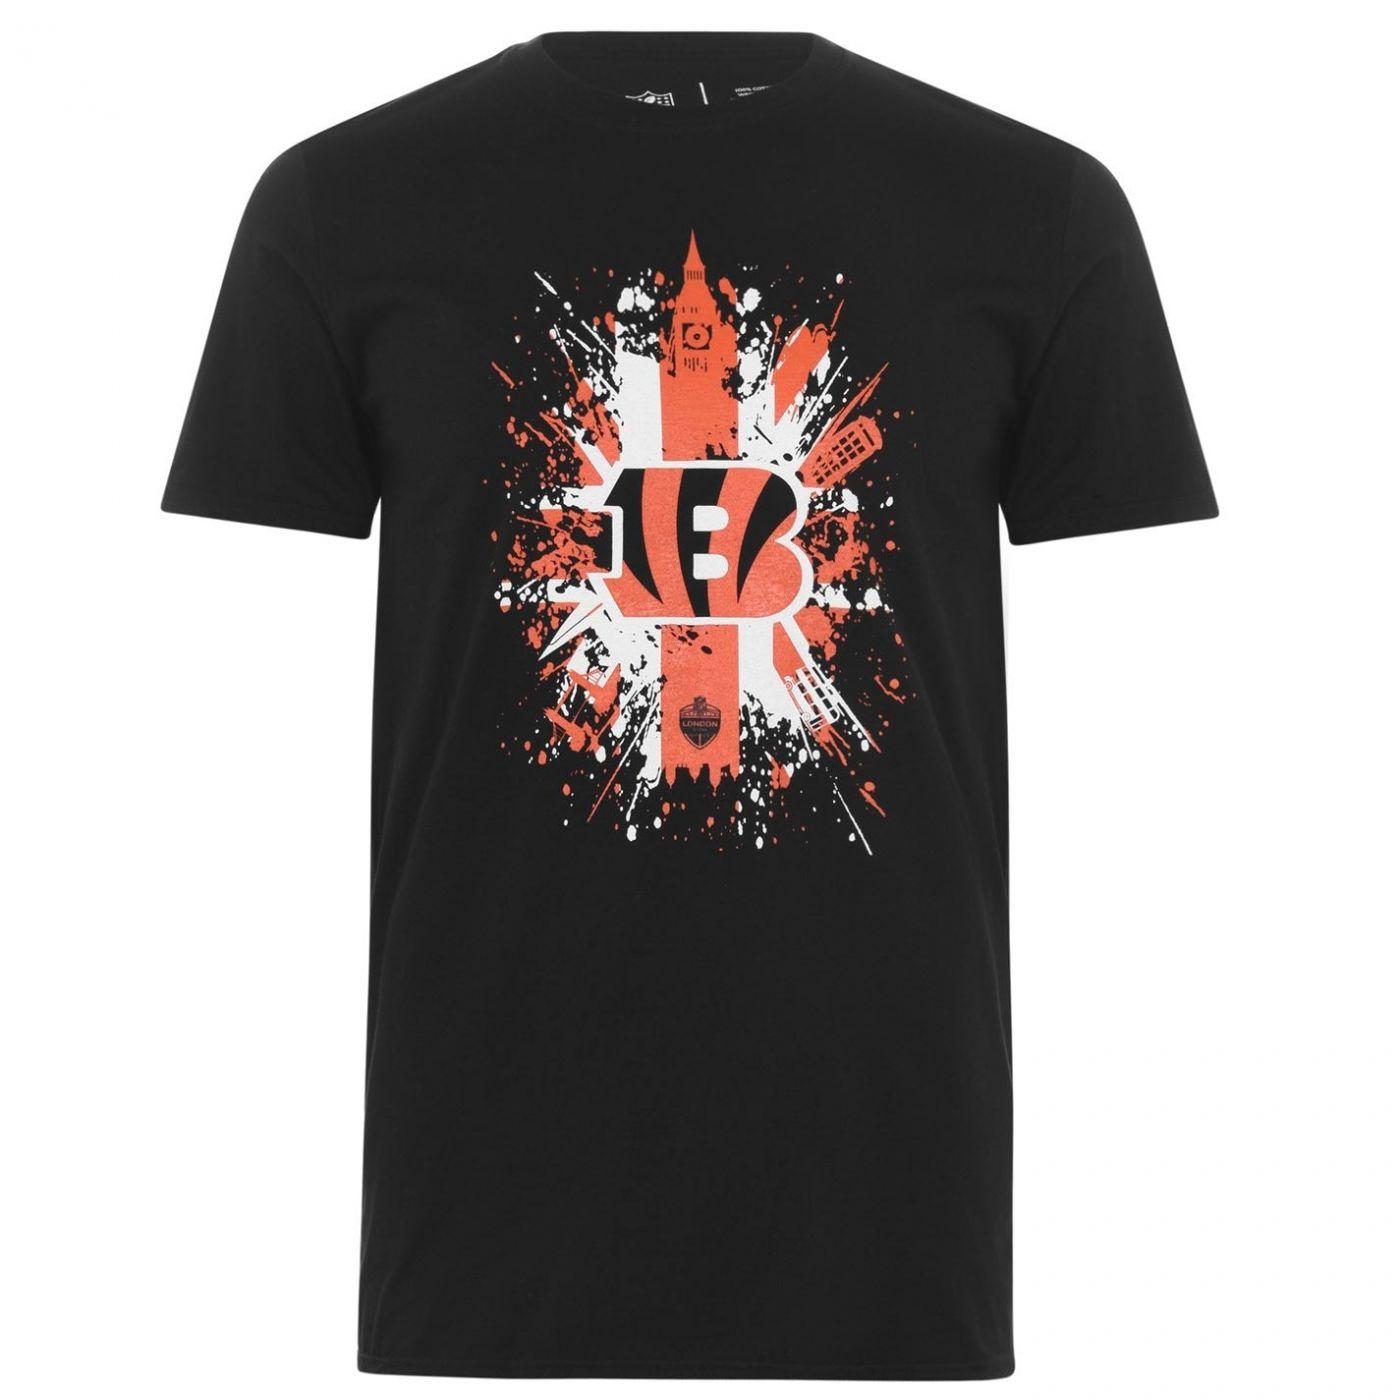 NFL London Games T Shirt Mens